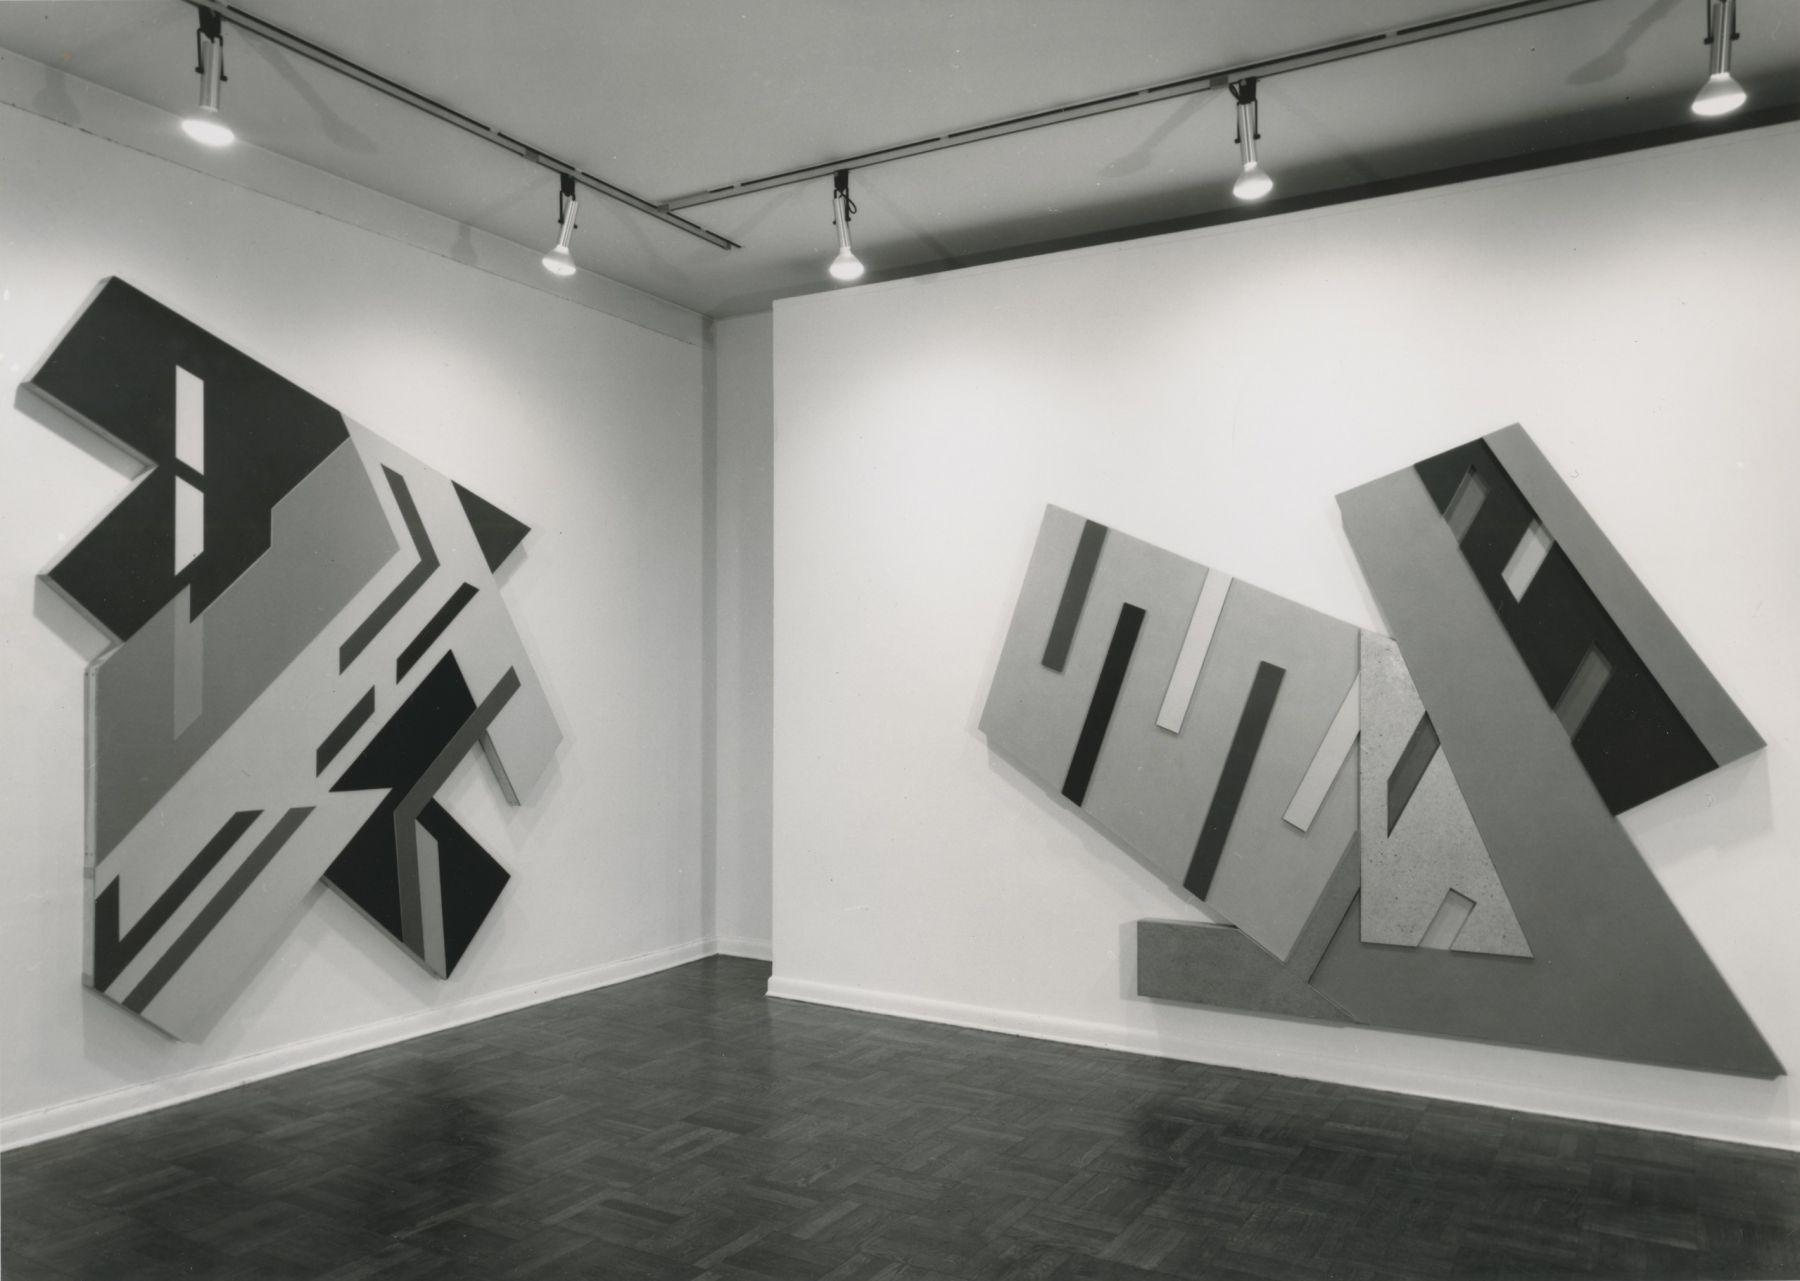 Installation view, Frank Stella, 4 EAST 77